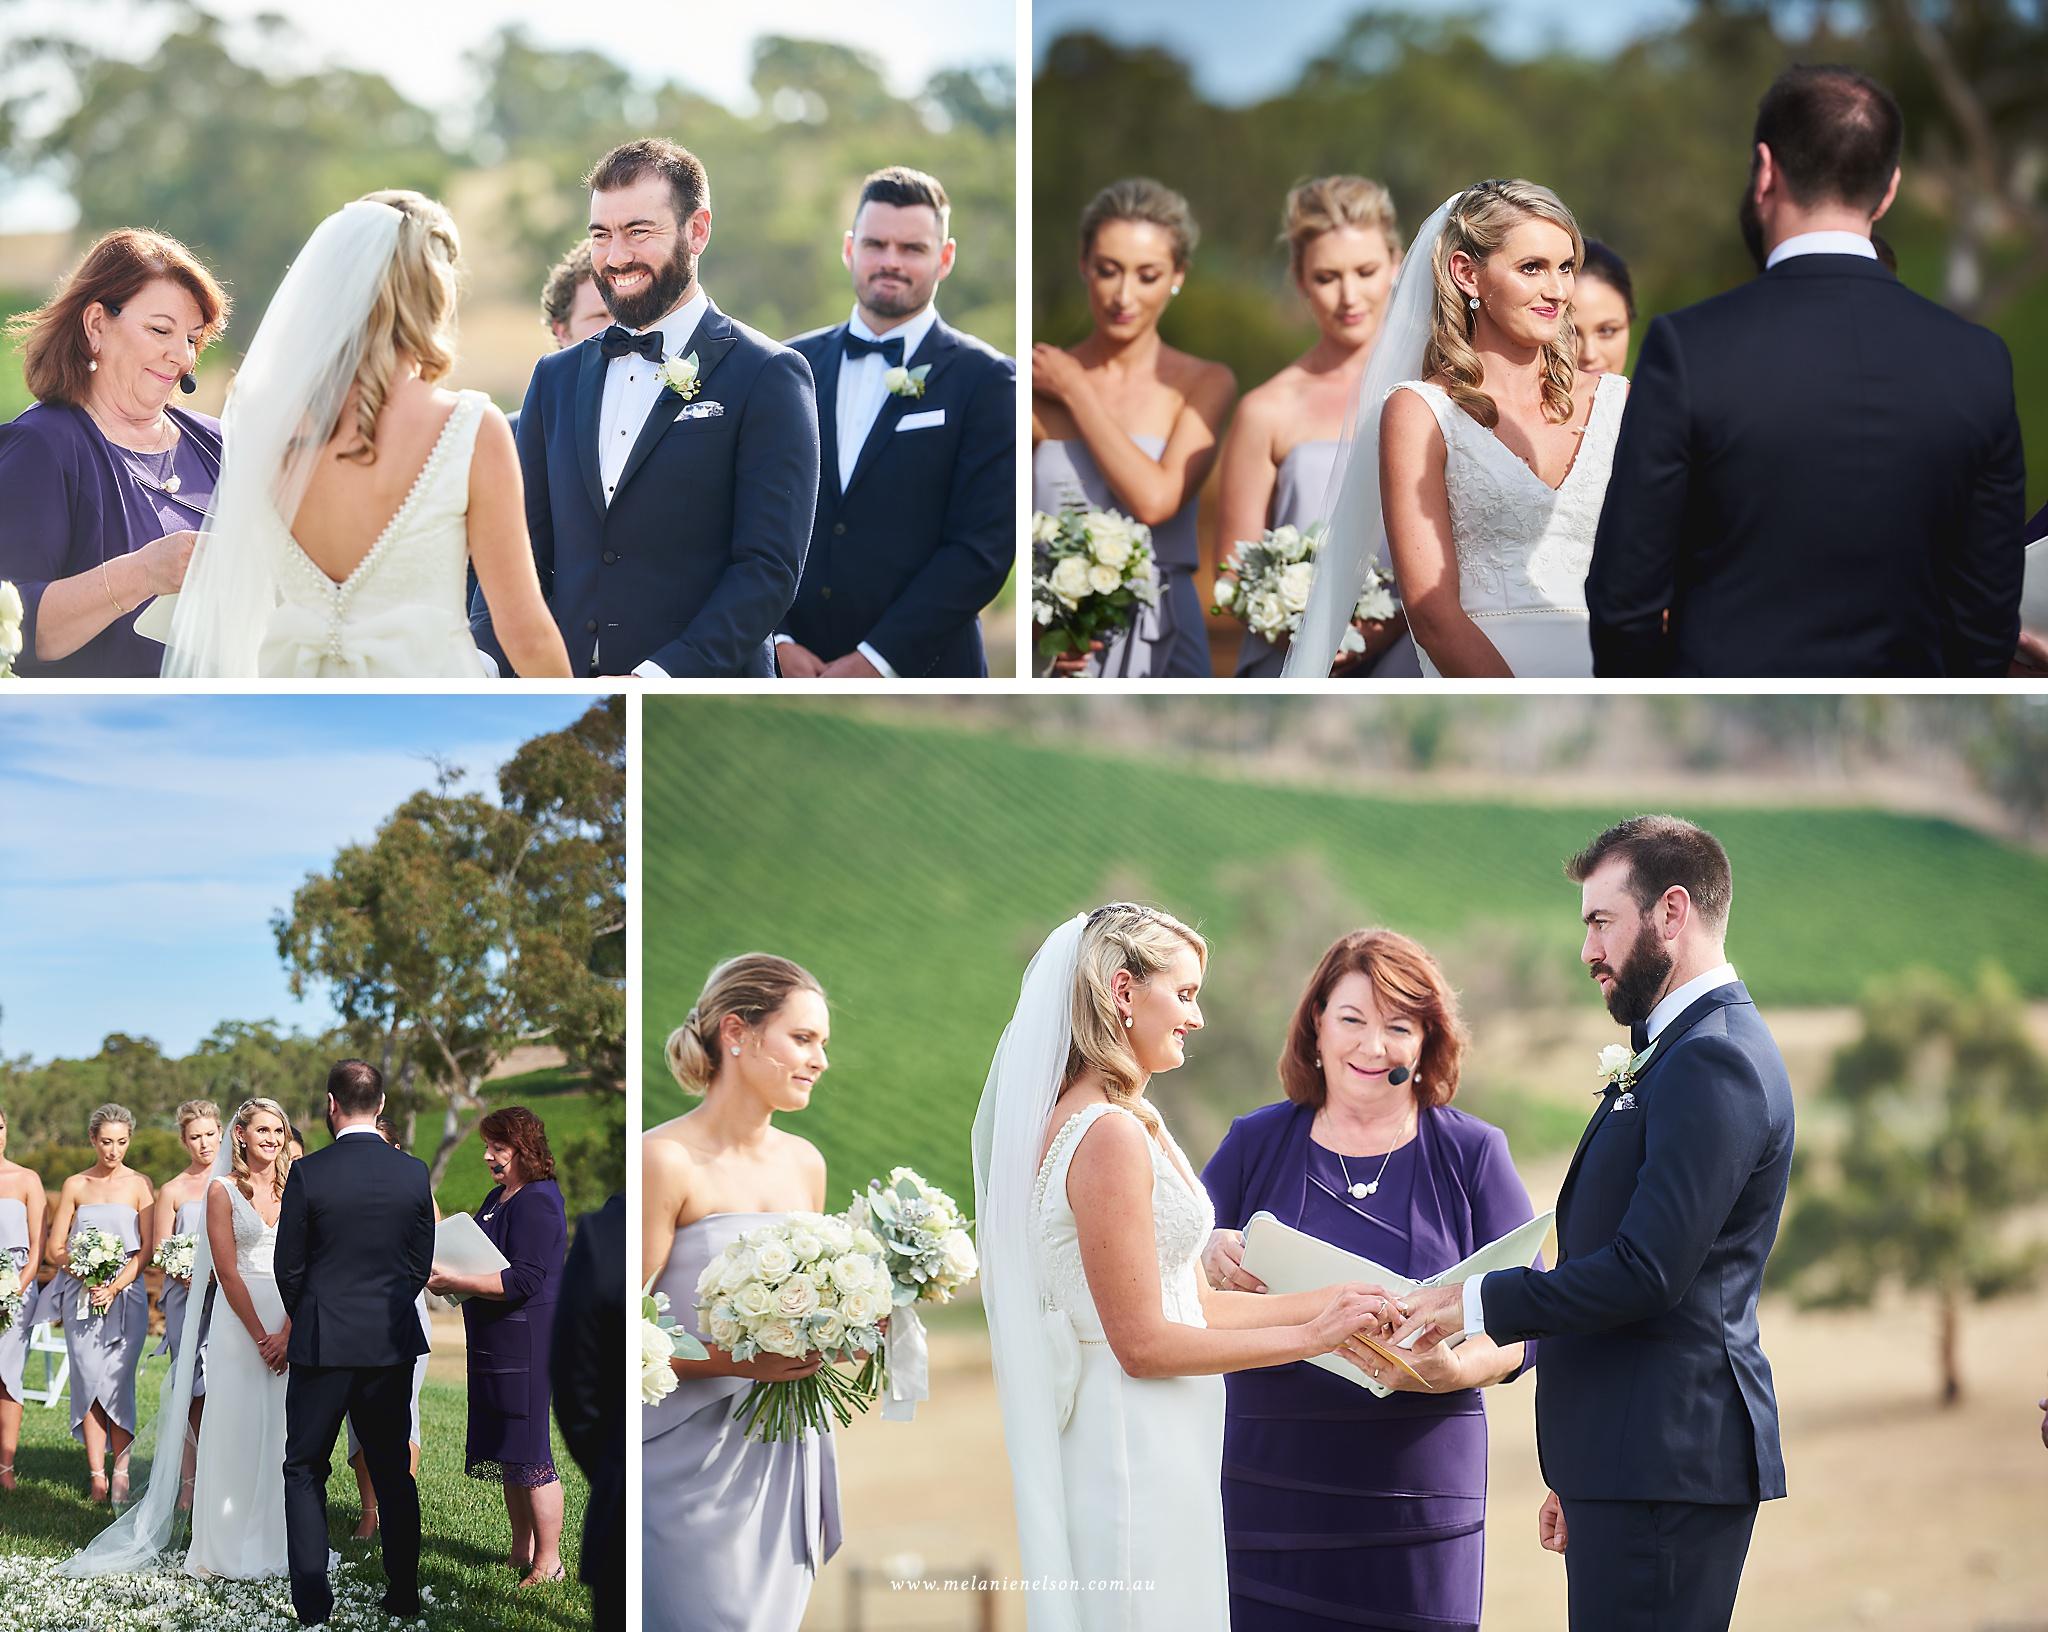 longview_vineyard_wedding_0041.jpg